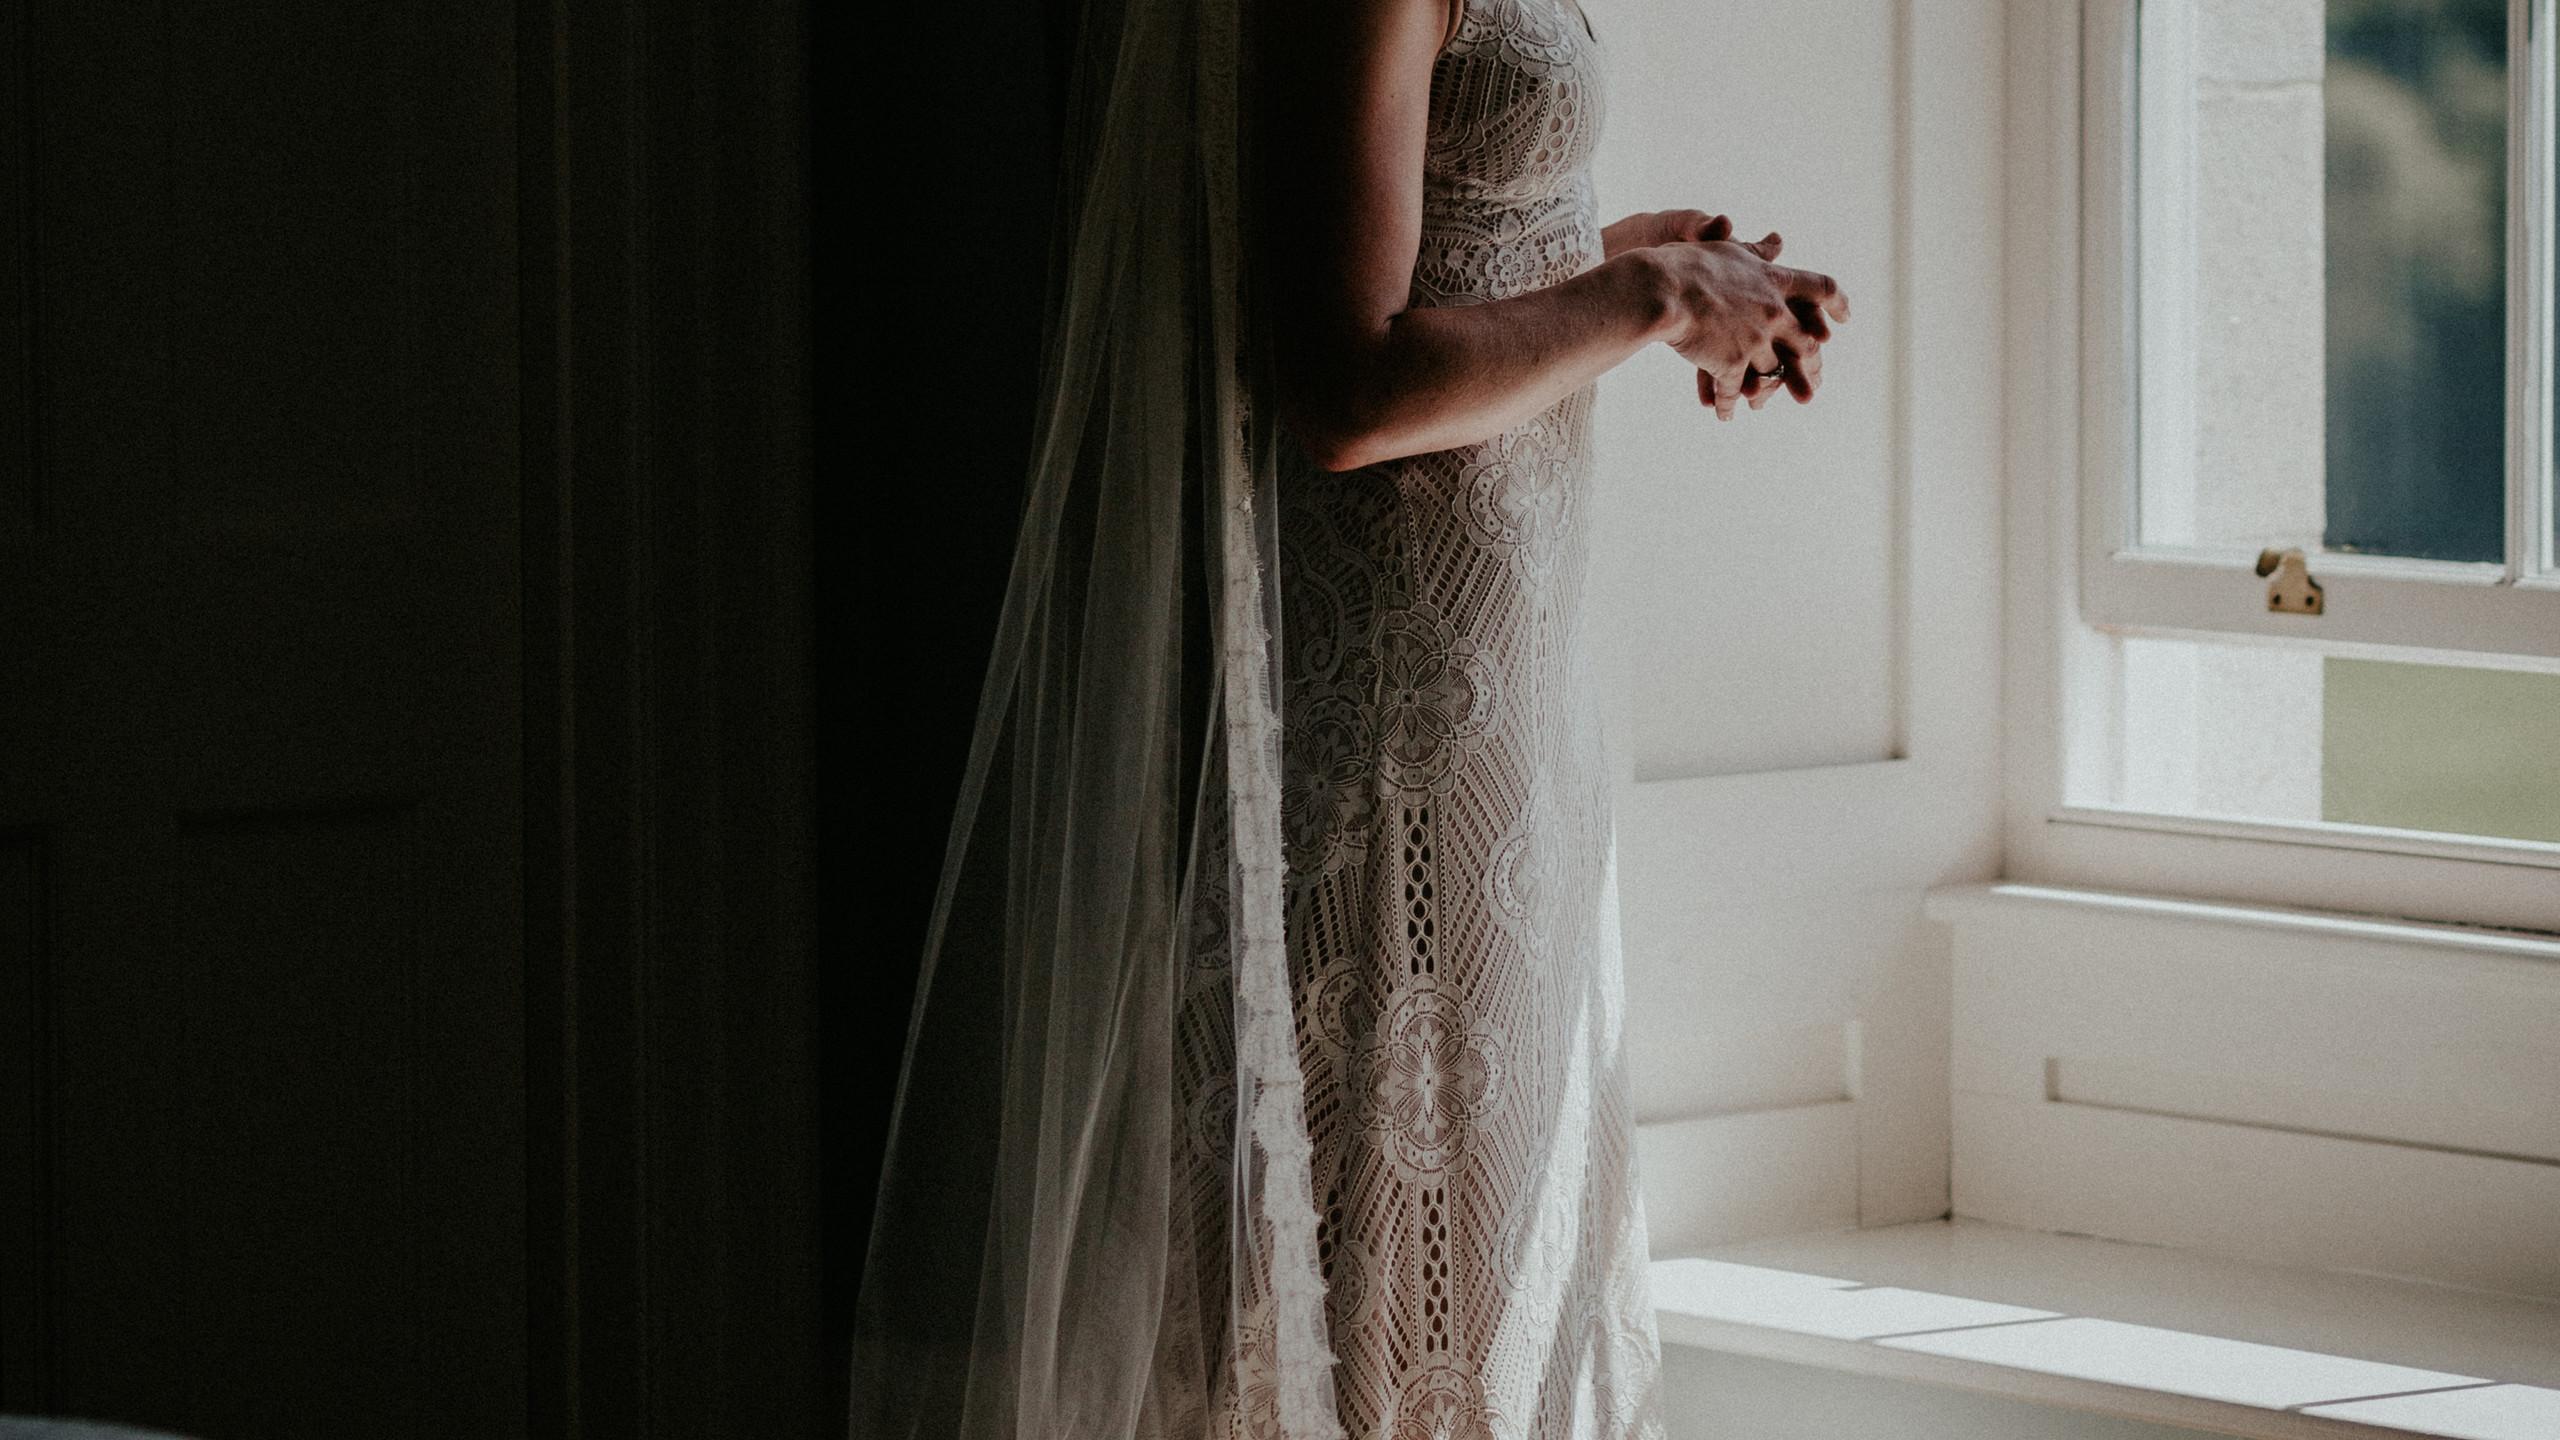 Olivia WR Fine-Art Photography